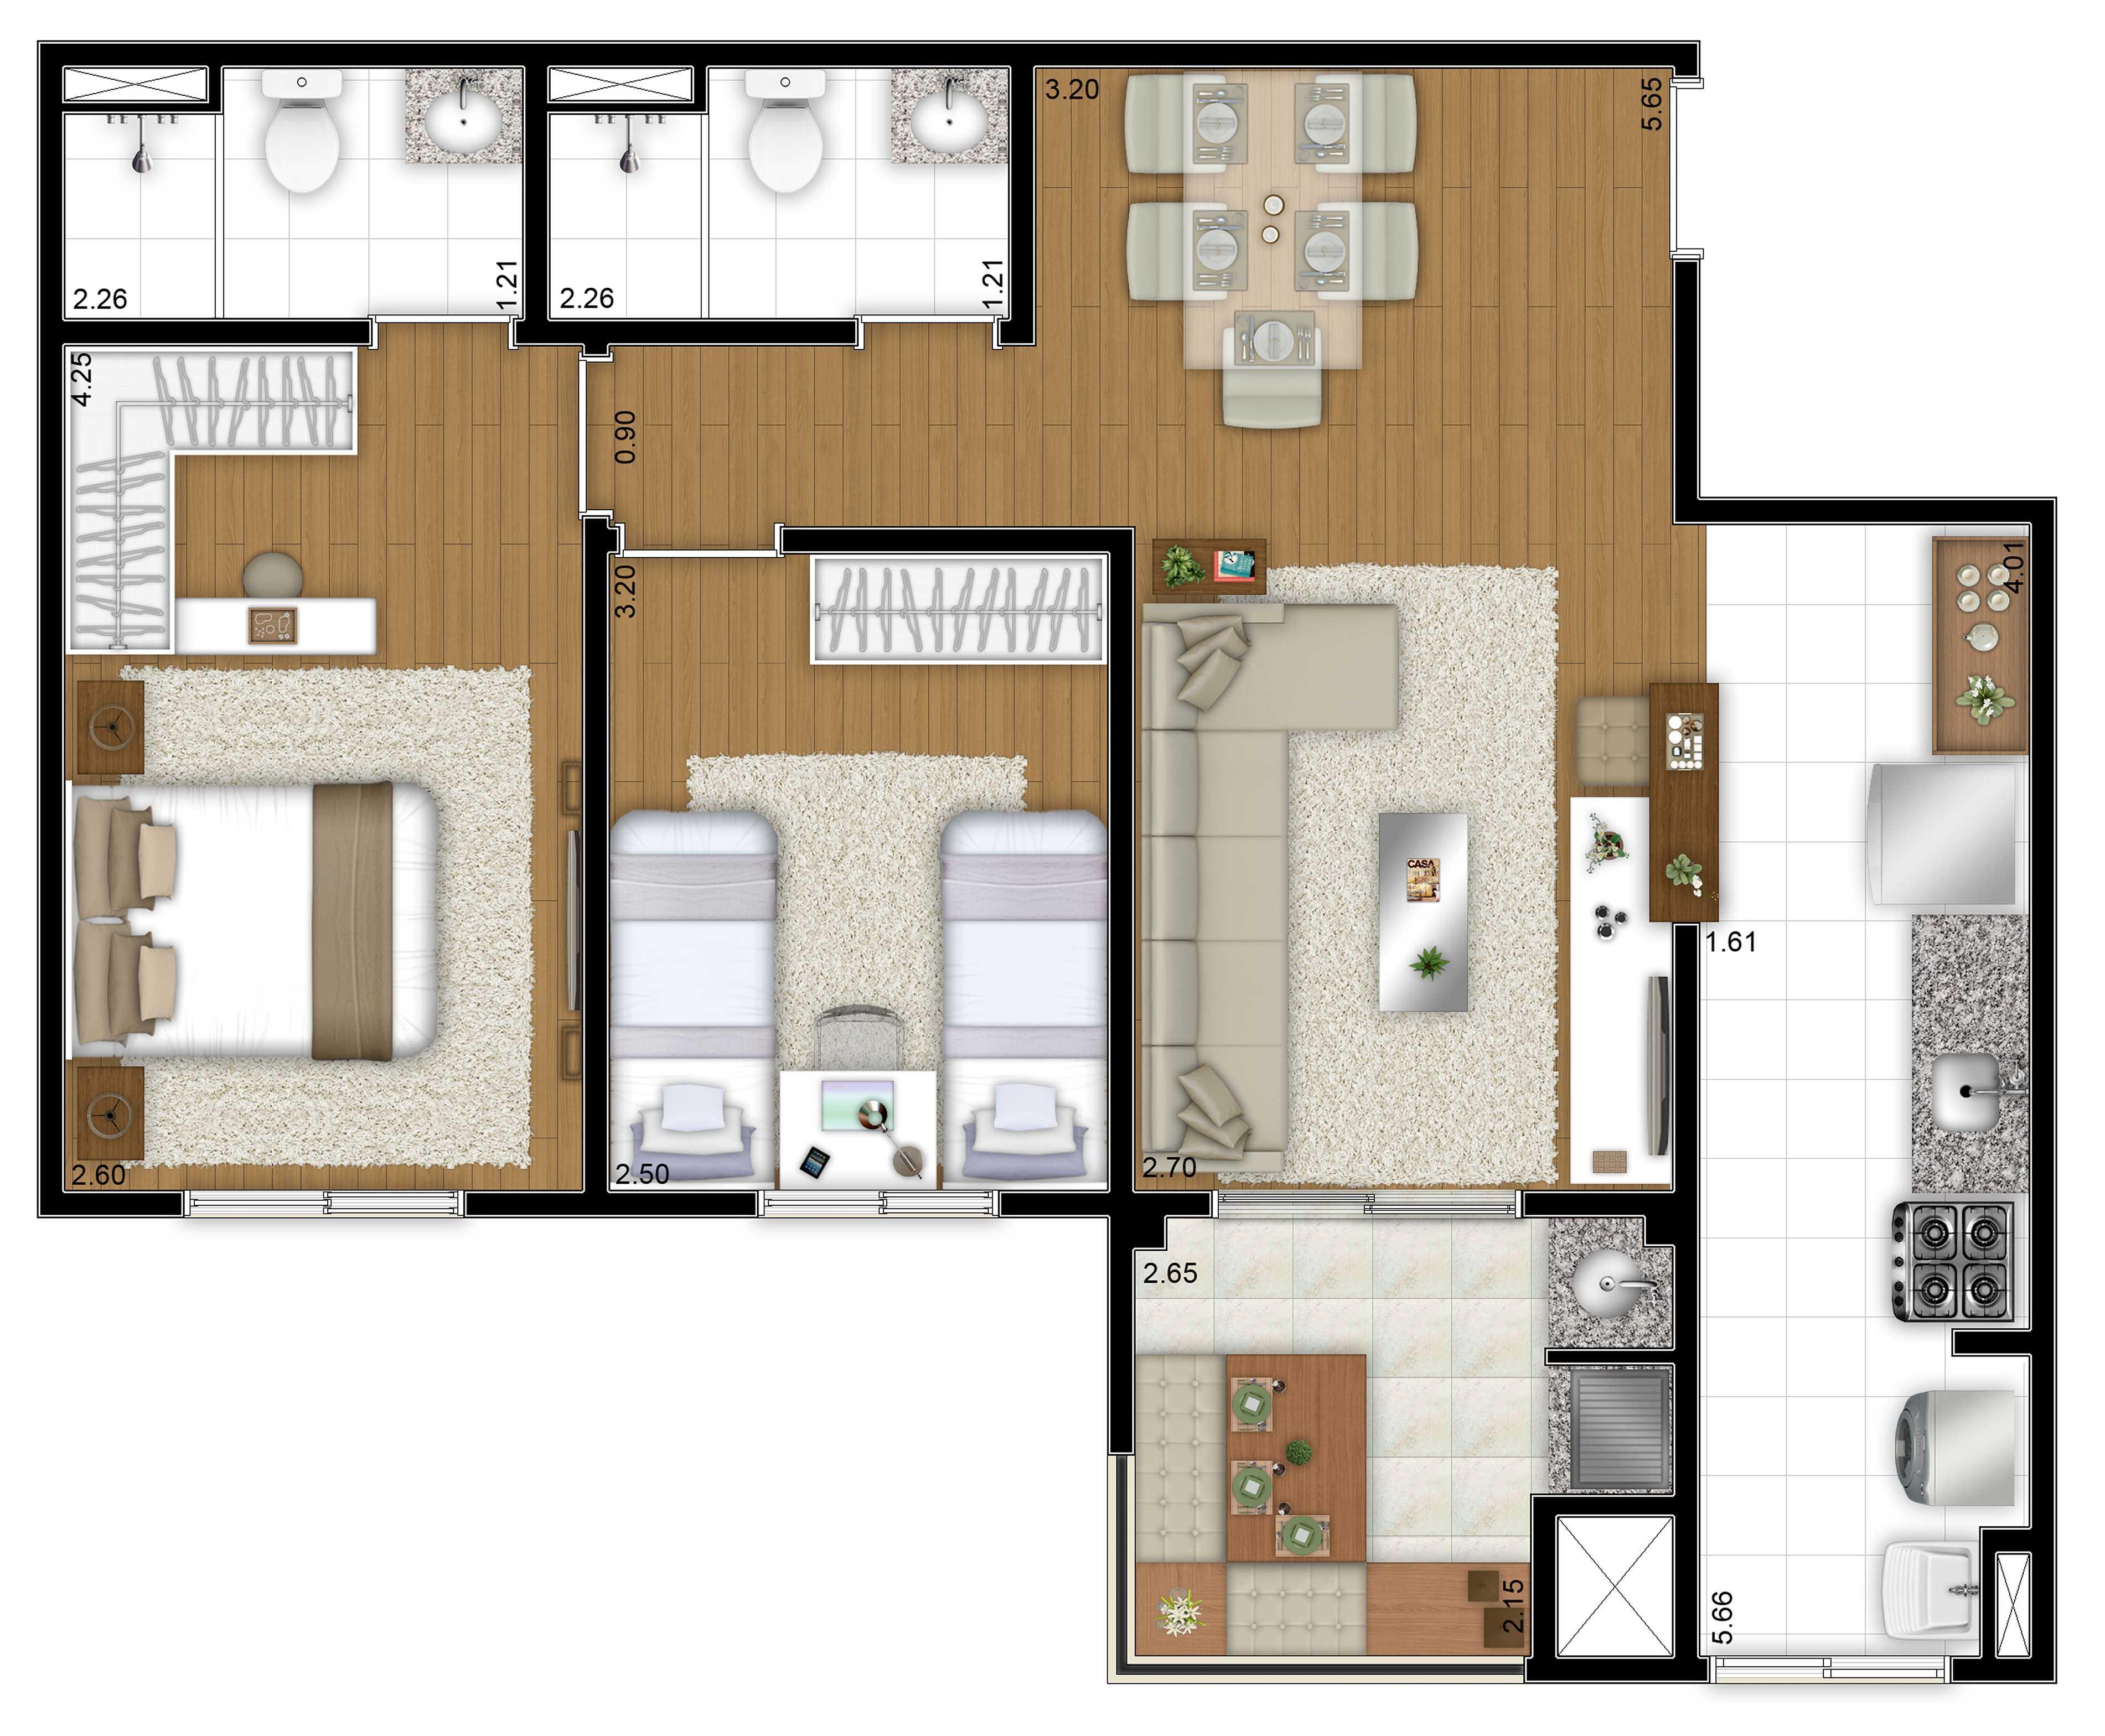 66,49m² - 2 dorms